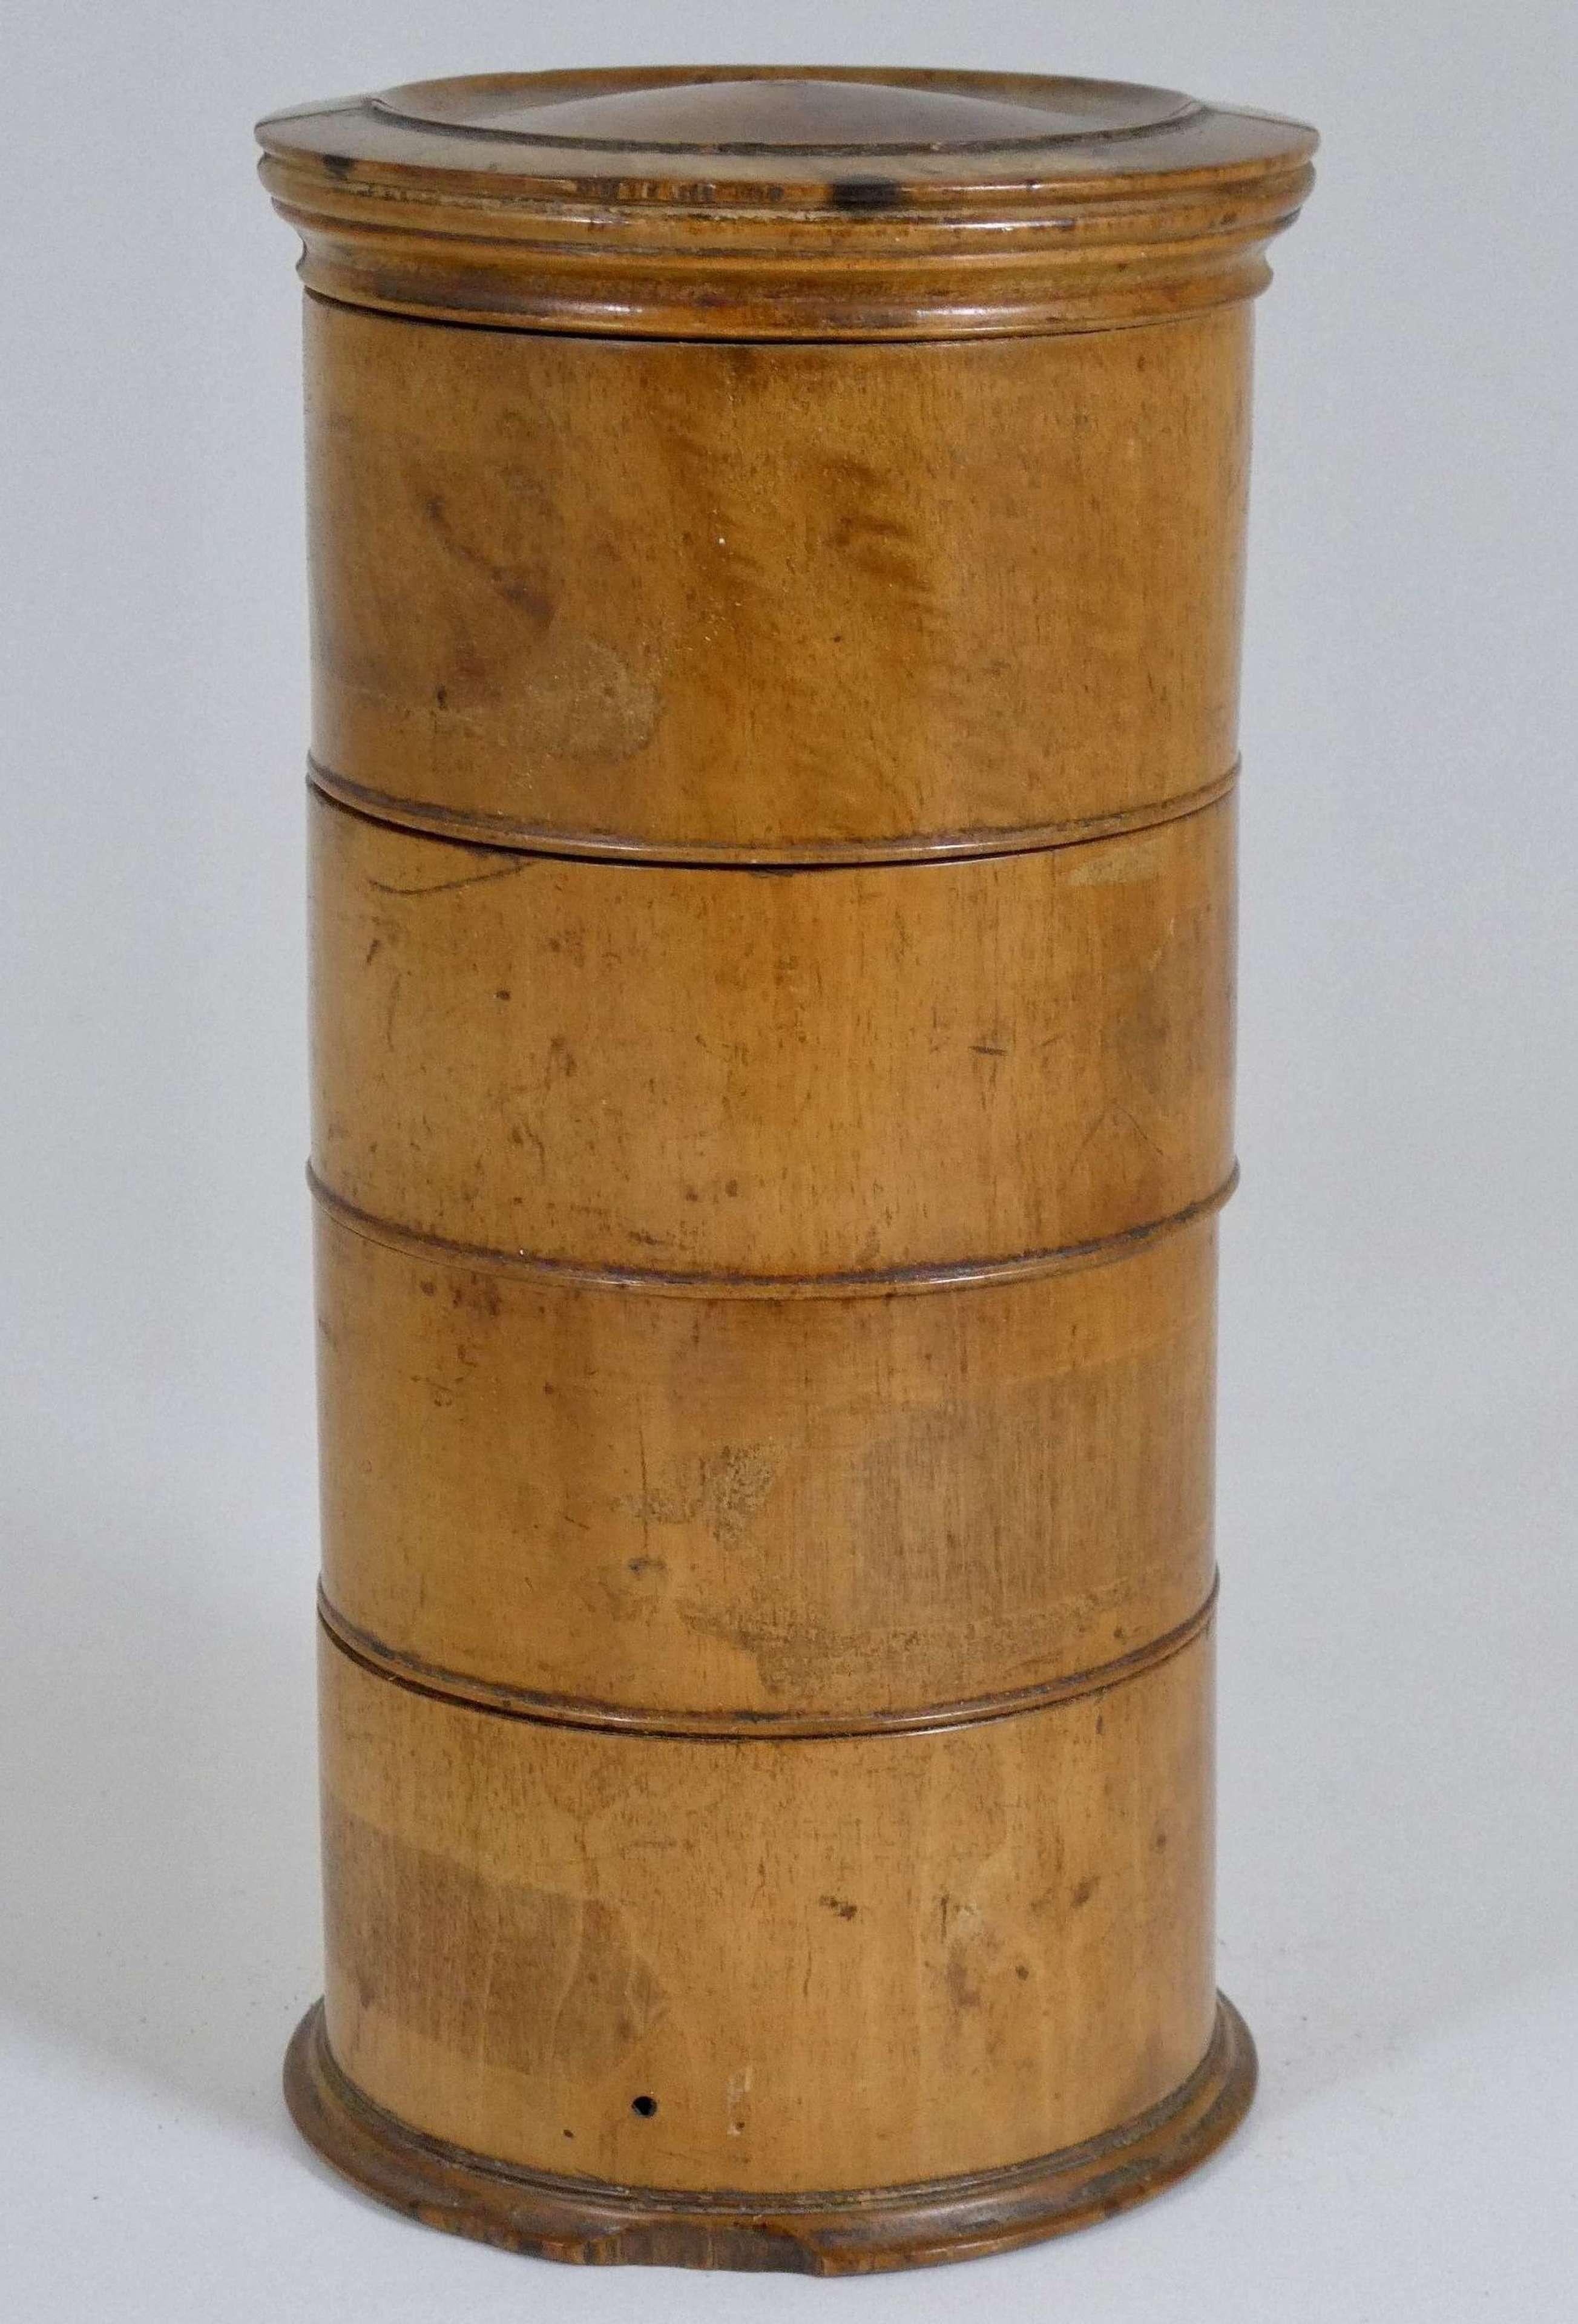 Treen Spice Tower, circa 1840